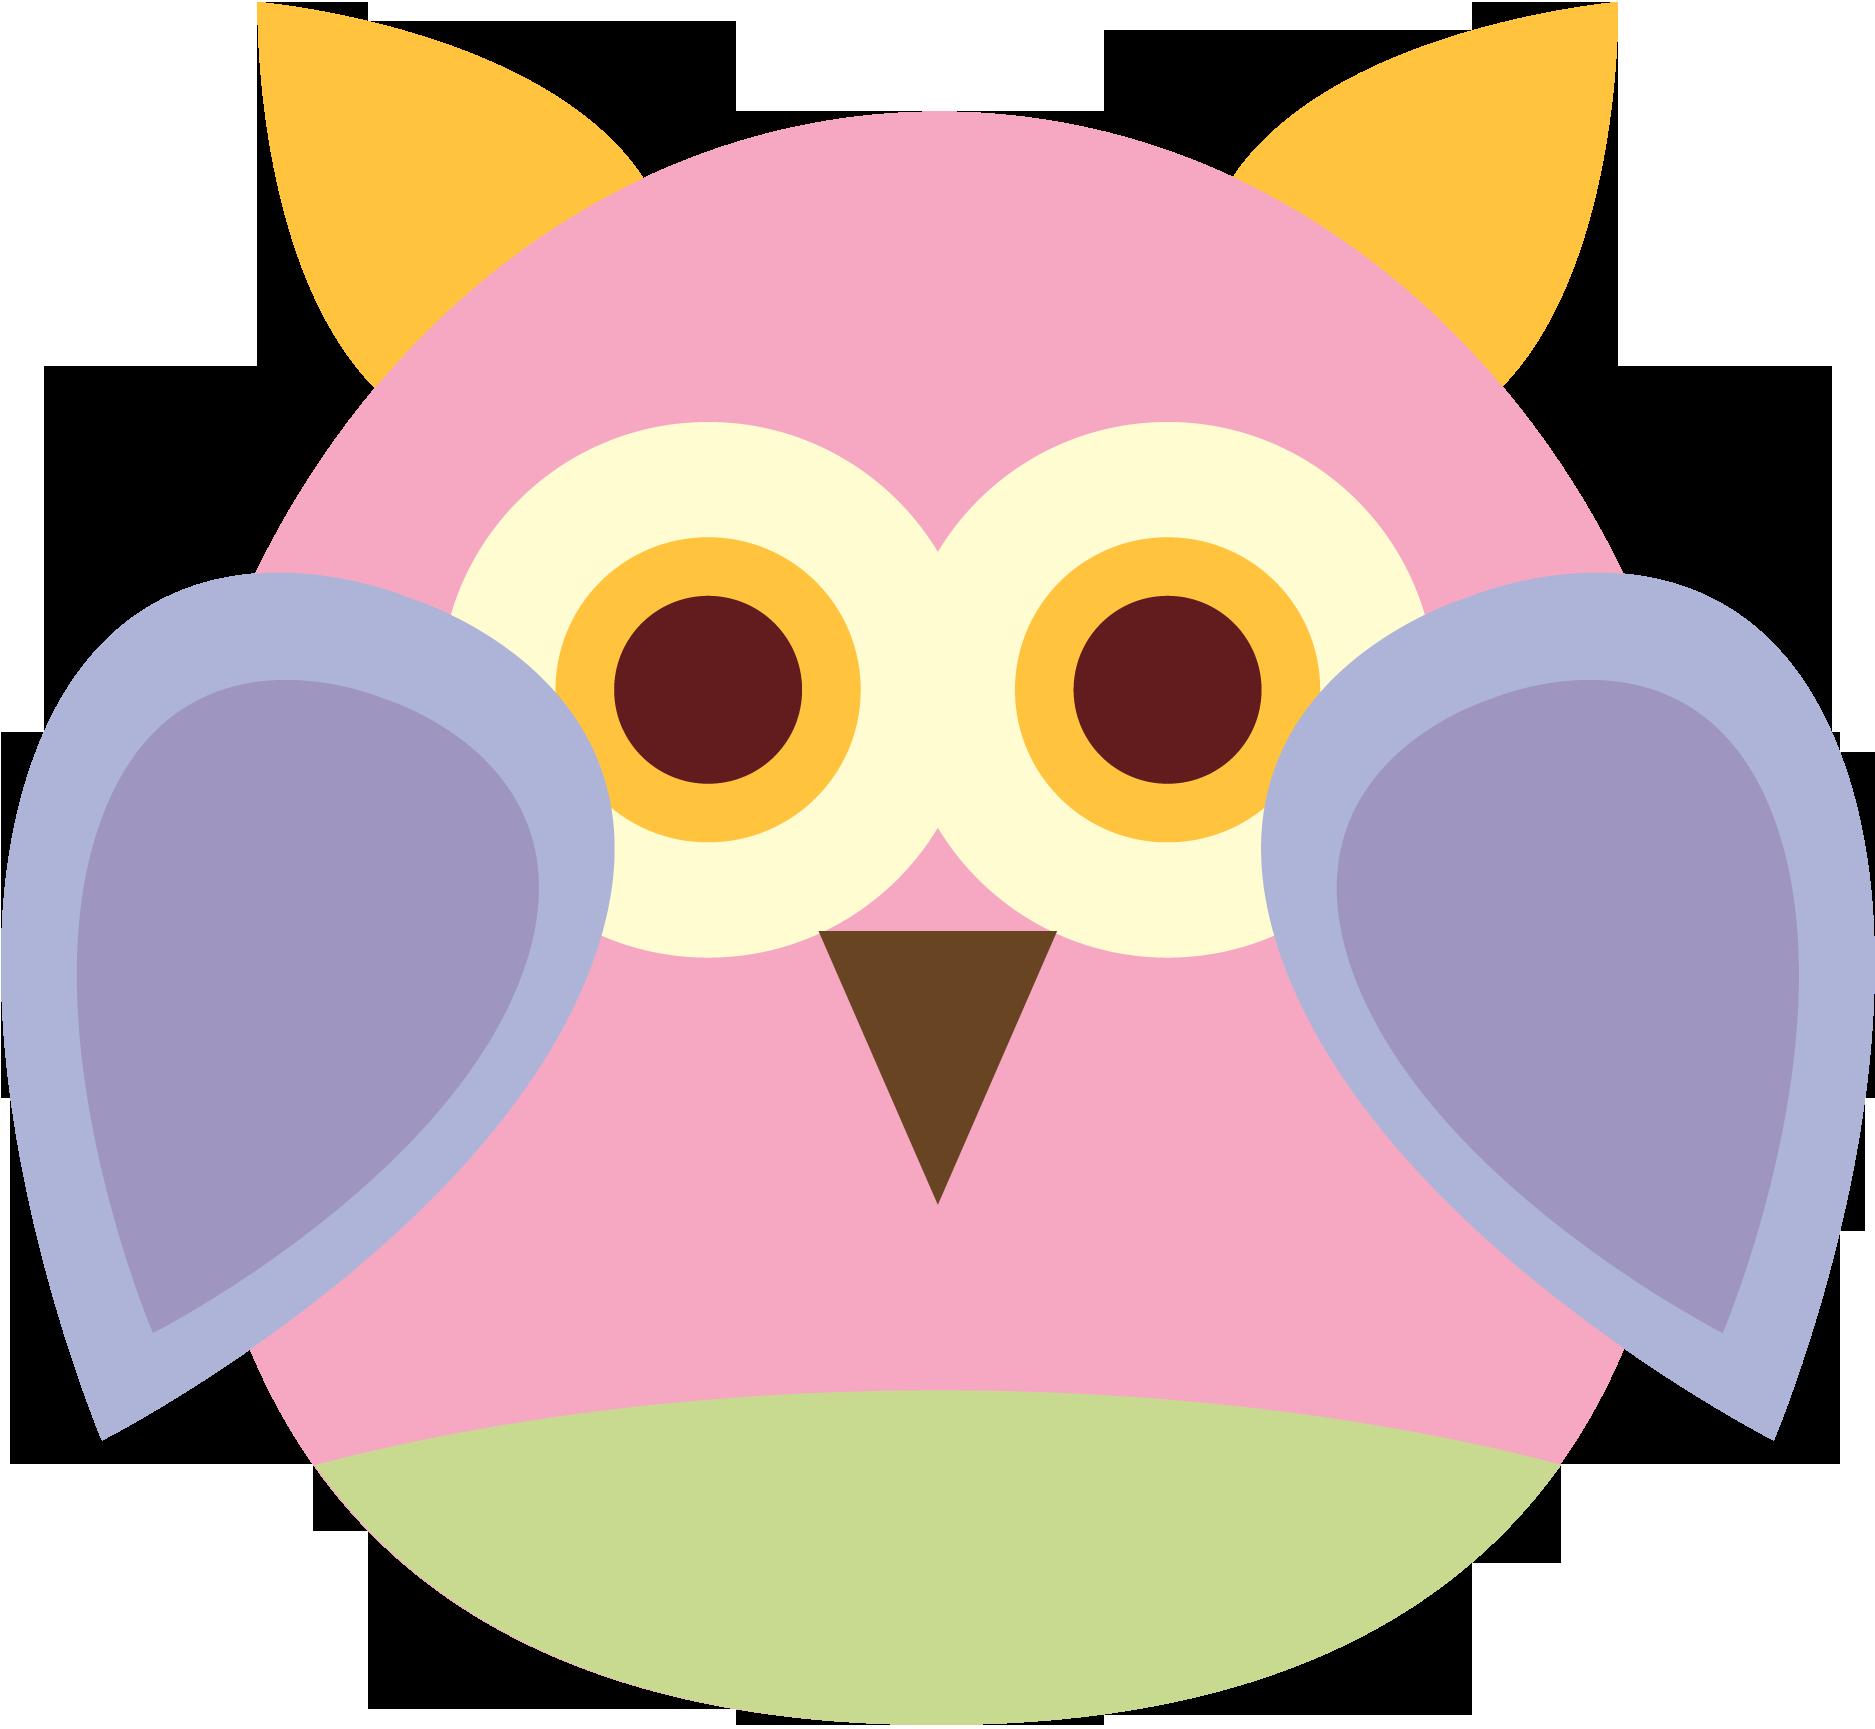 14 clip art owls cute clipart panda free clipart images rh clipartpanda com cute clipart pinterest cute clip art images